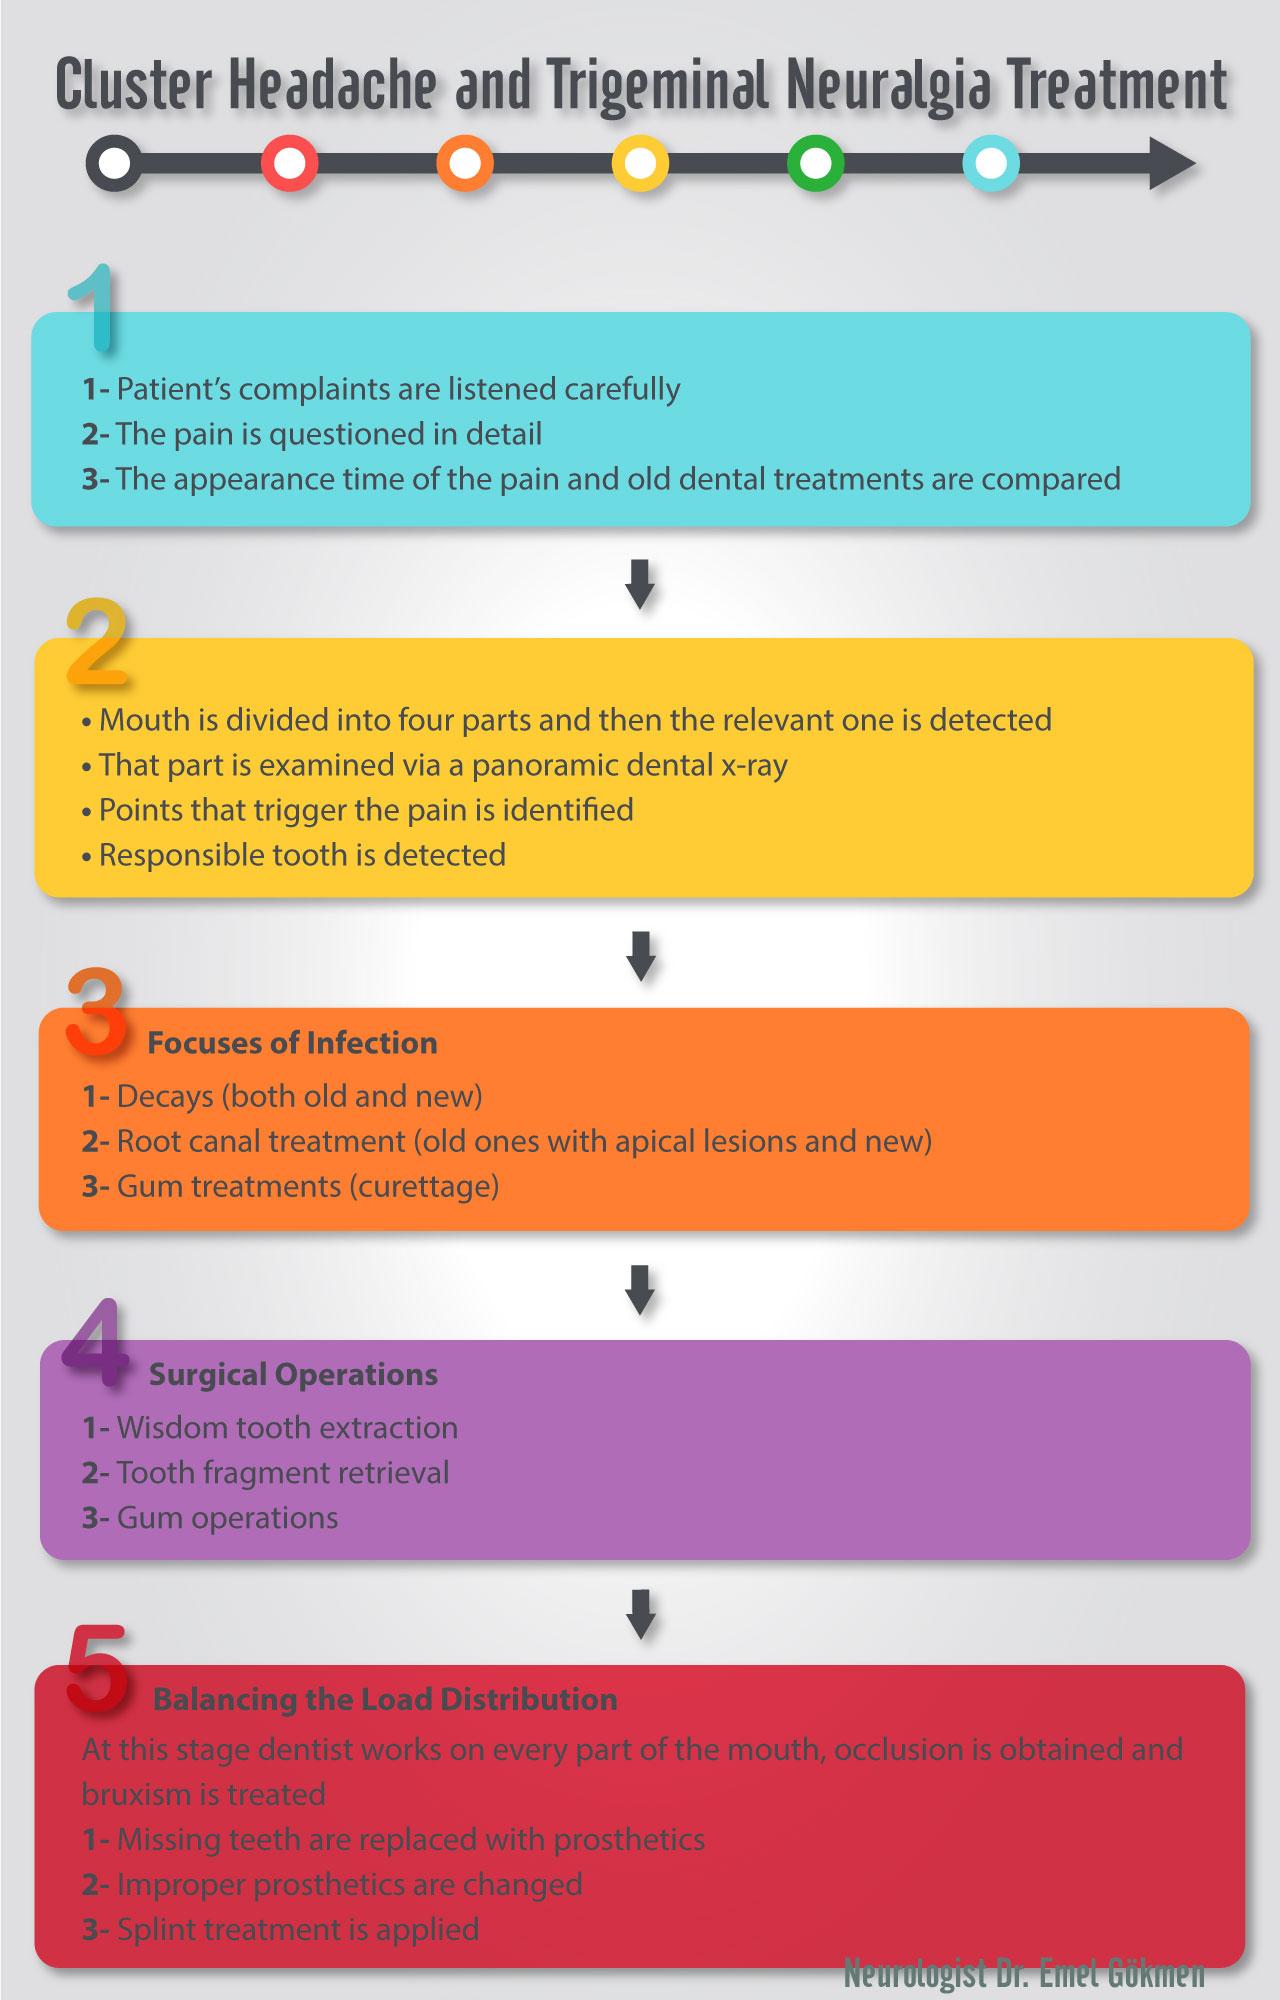 Cluster headache and trigeminal neuralgia treatment Dr. Emel Gokmen